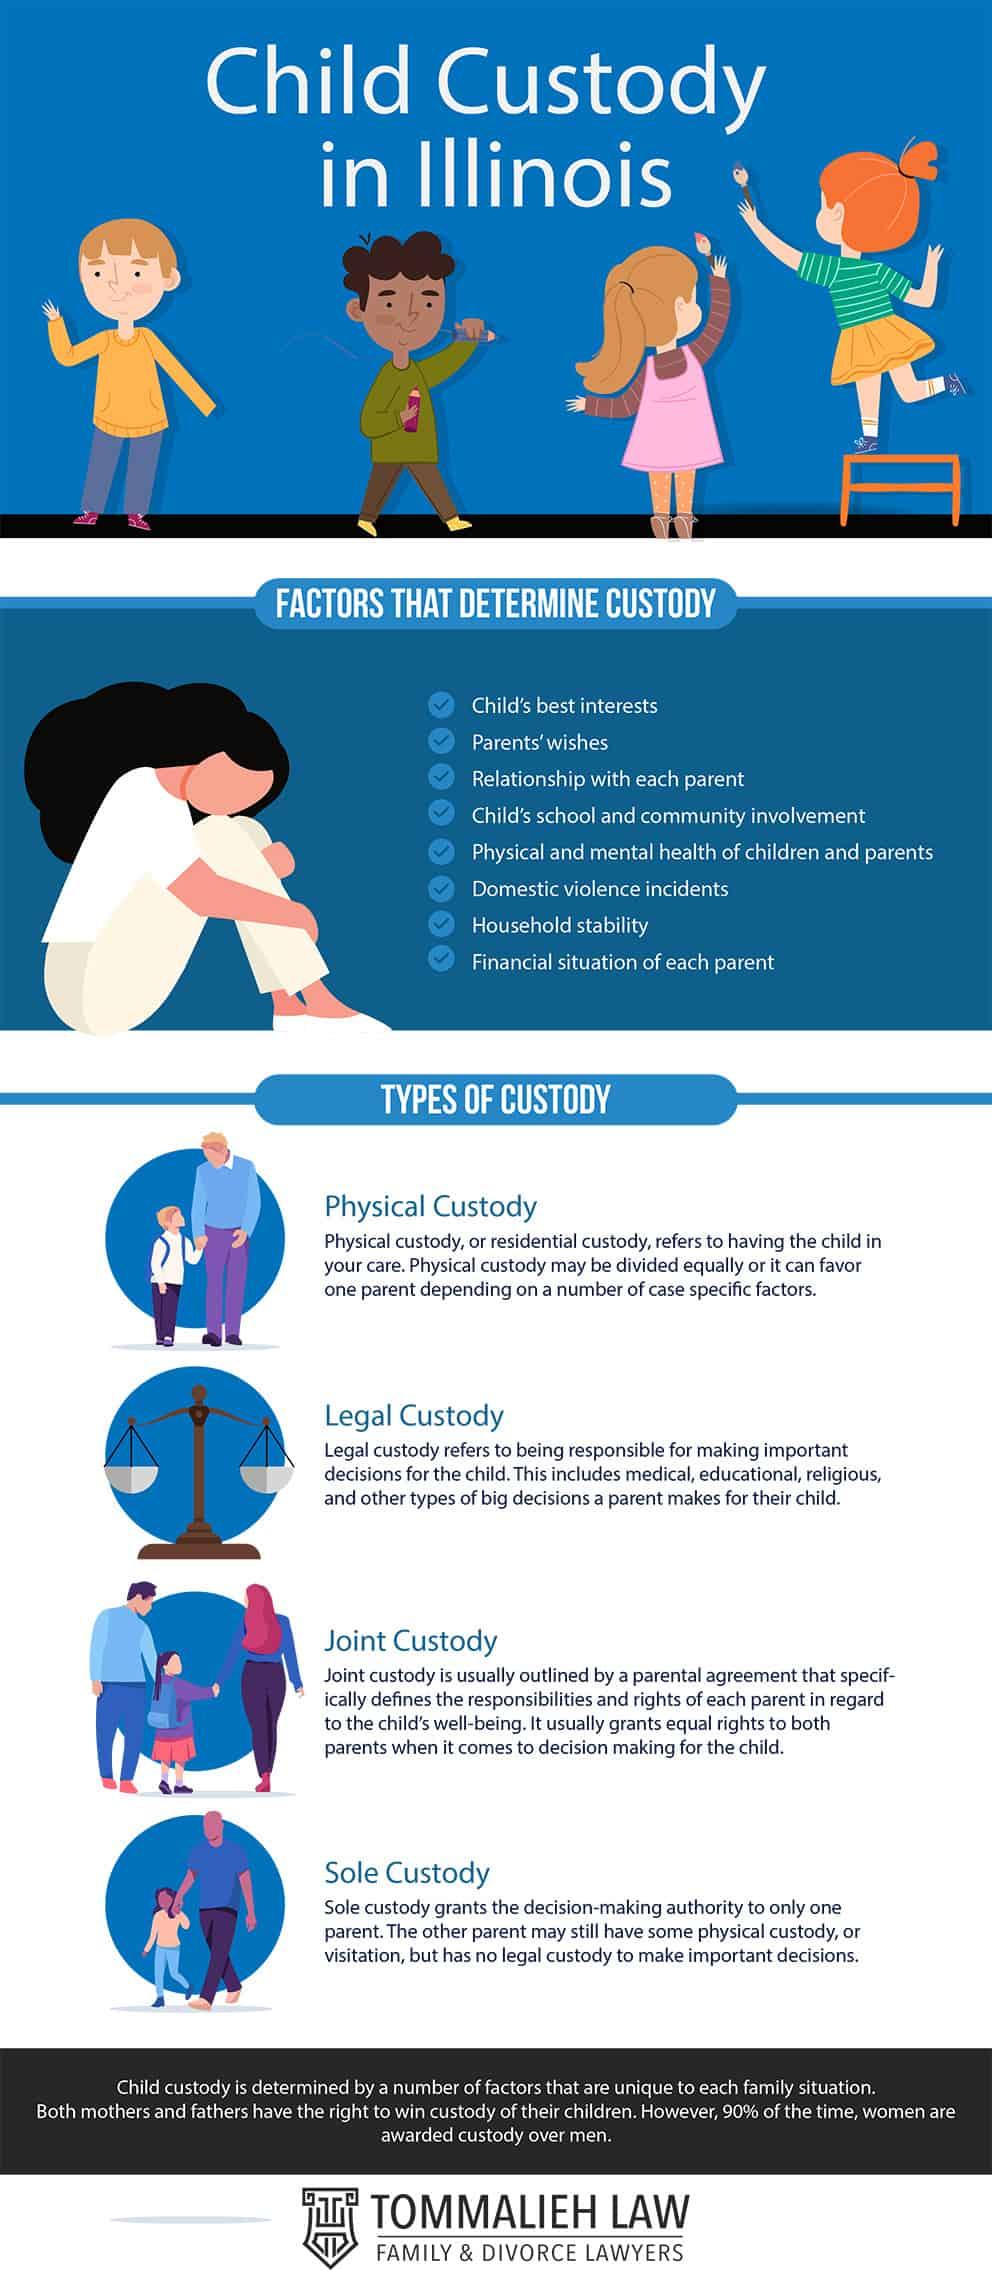 child custody in illinois infographic